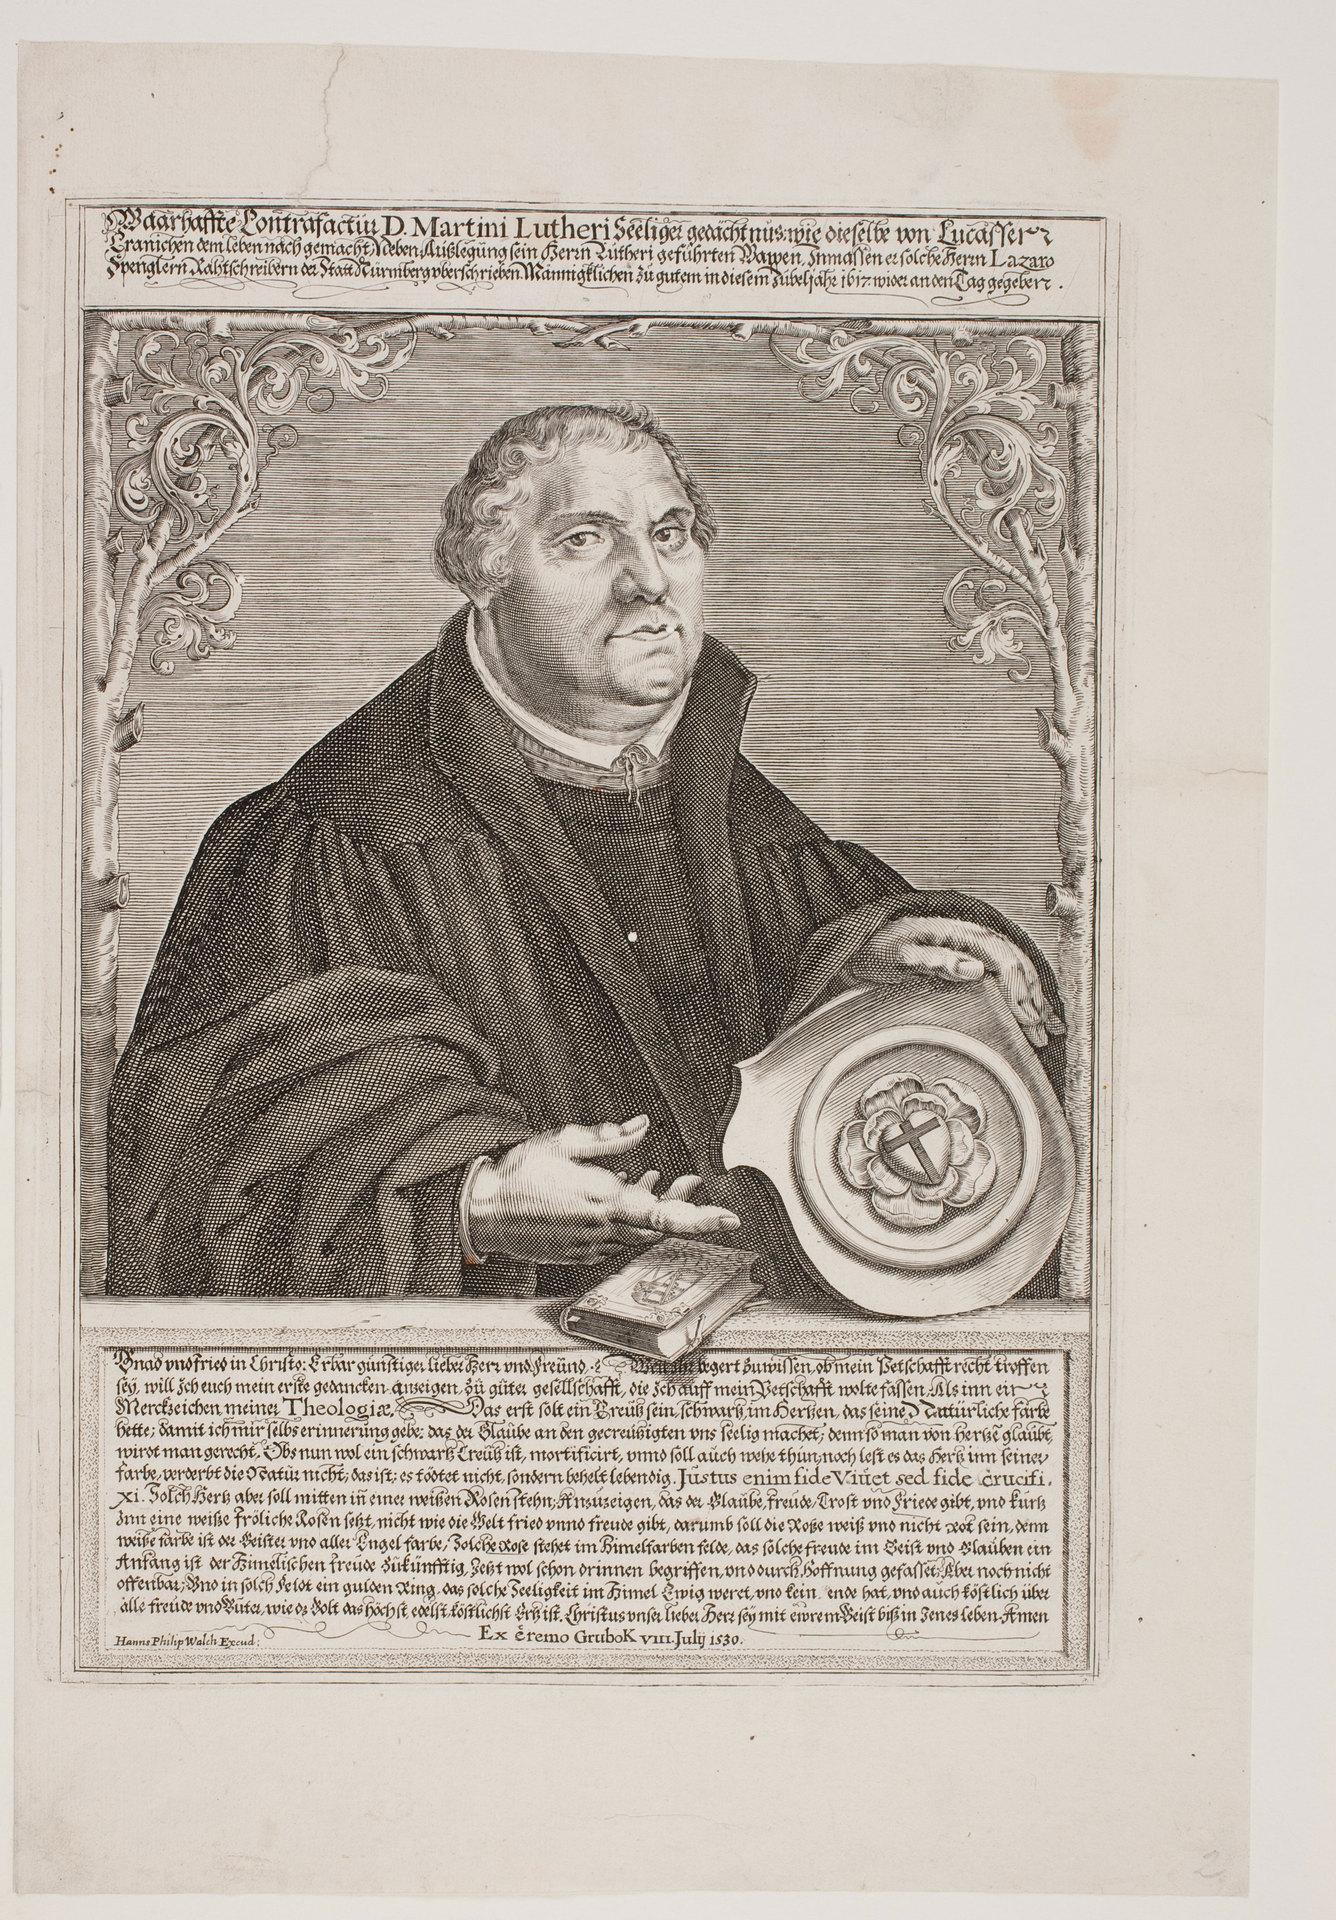 Waarhaffte Contrafactur D. Martini Lutheri